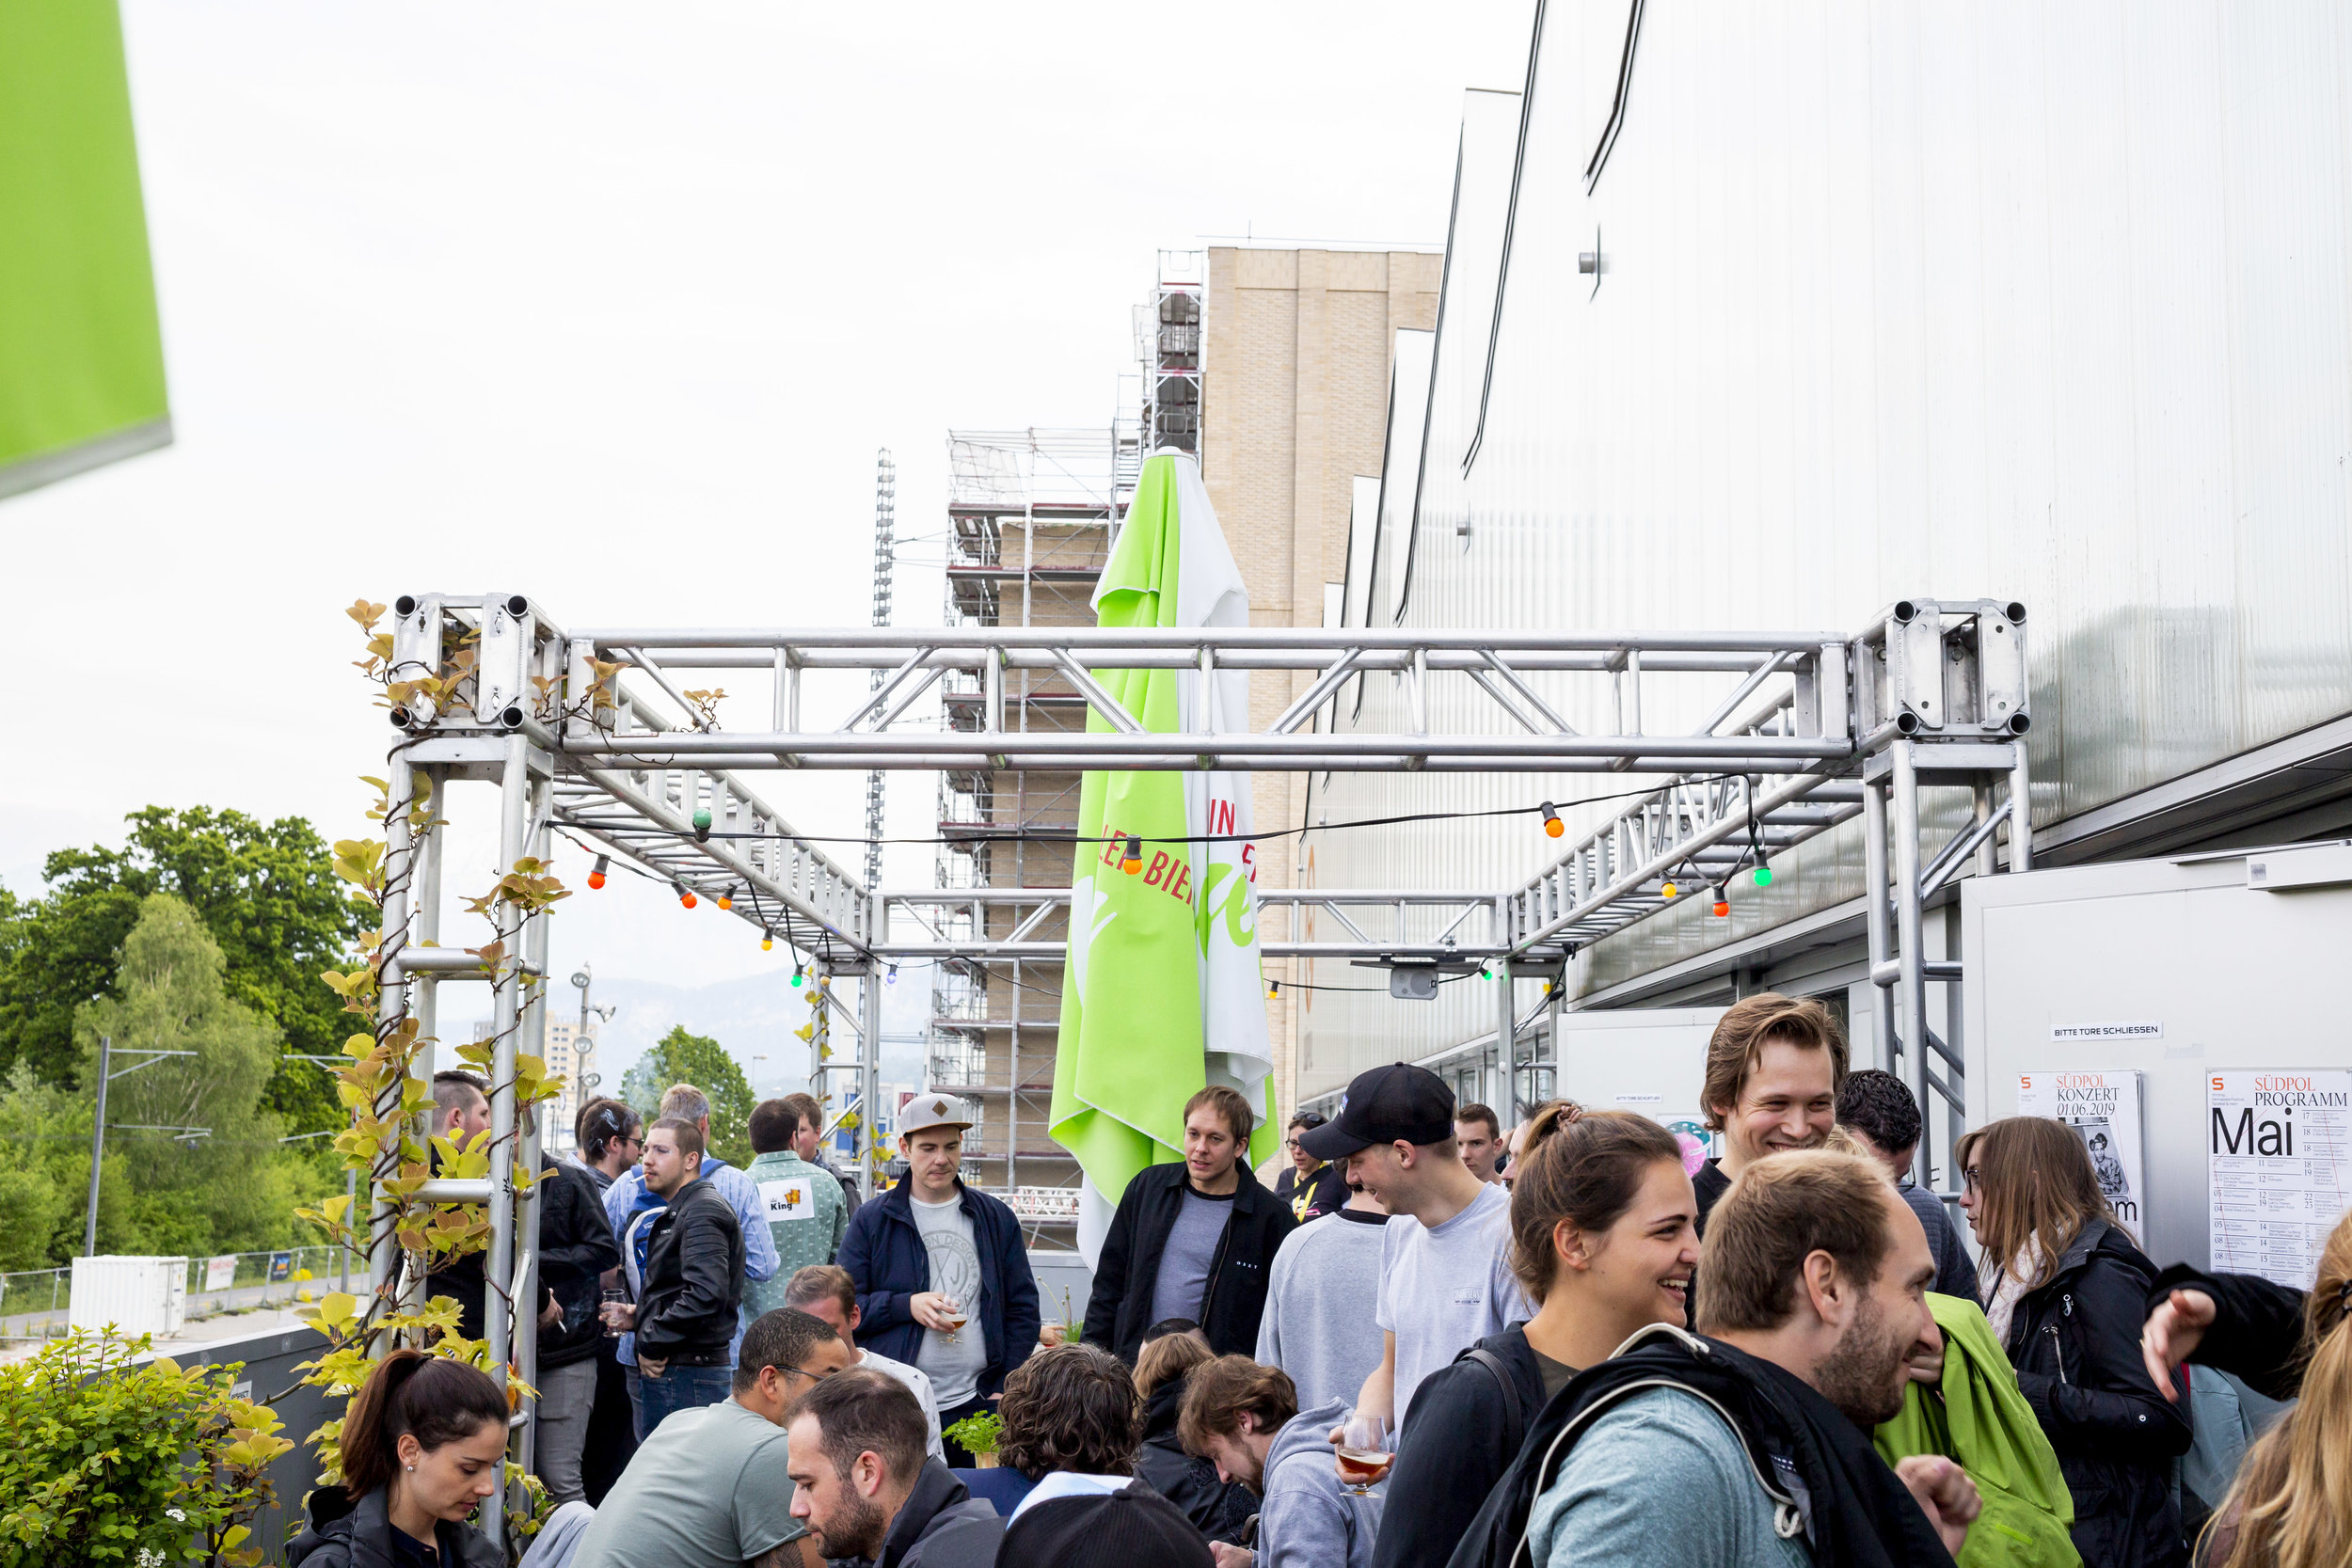 BierfestivalLuzern-54.jpg